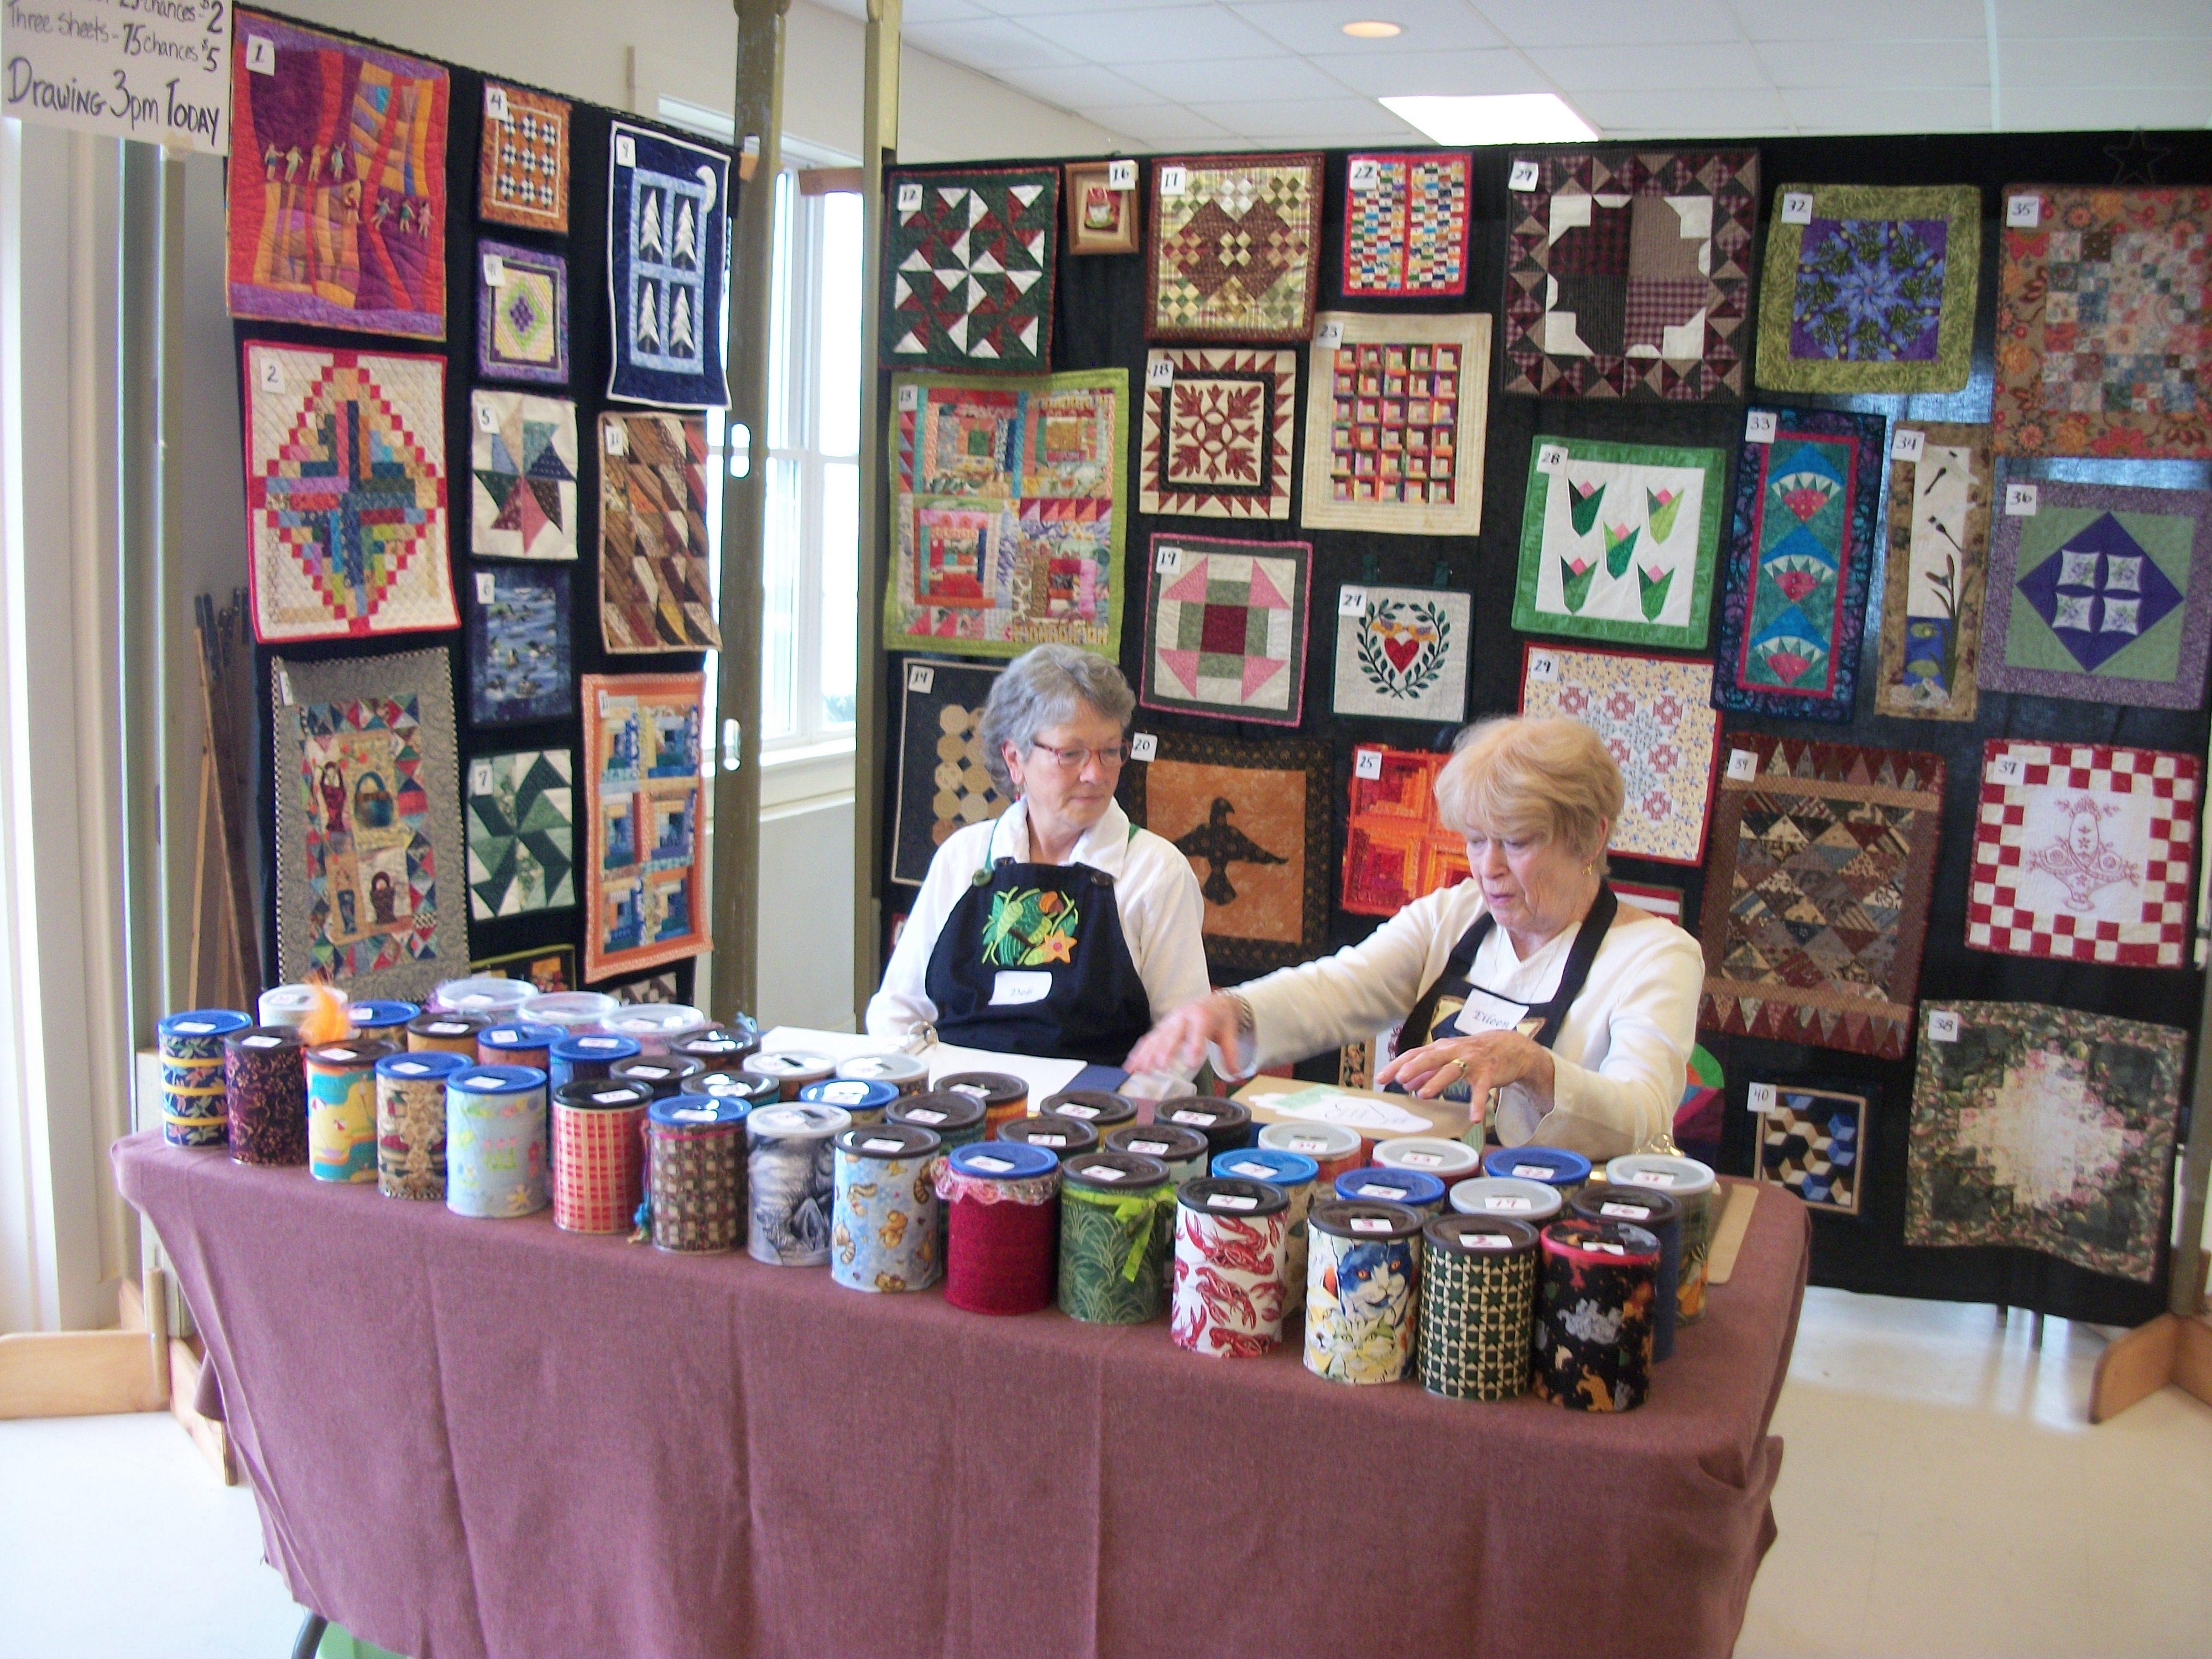 Nancy's Quilt Shop | Louisa Enright's Blog : little quilts - Adamdwight.com